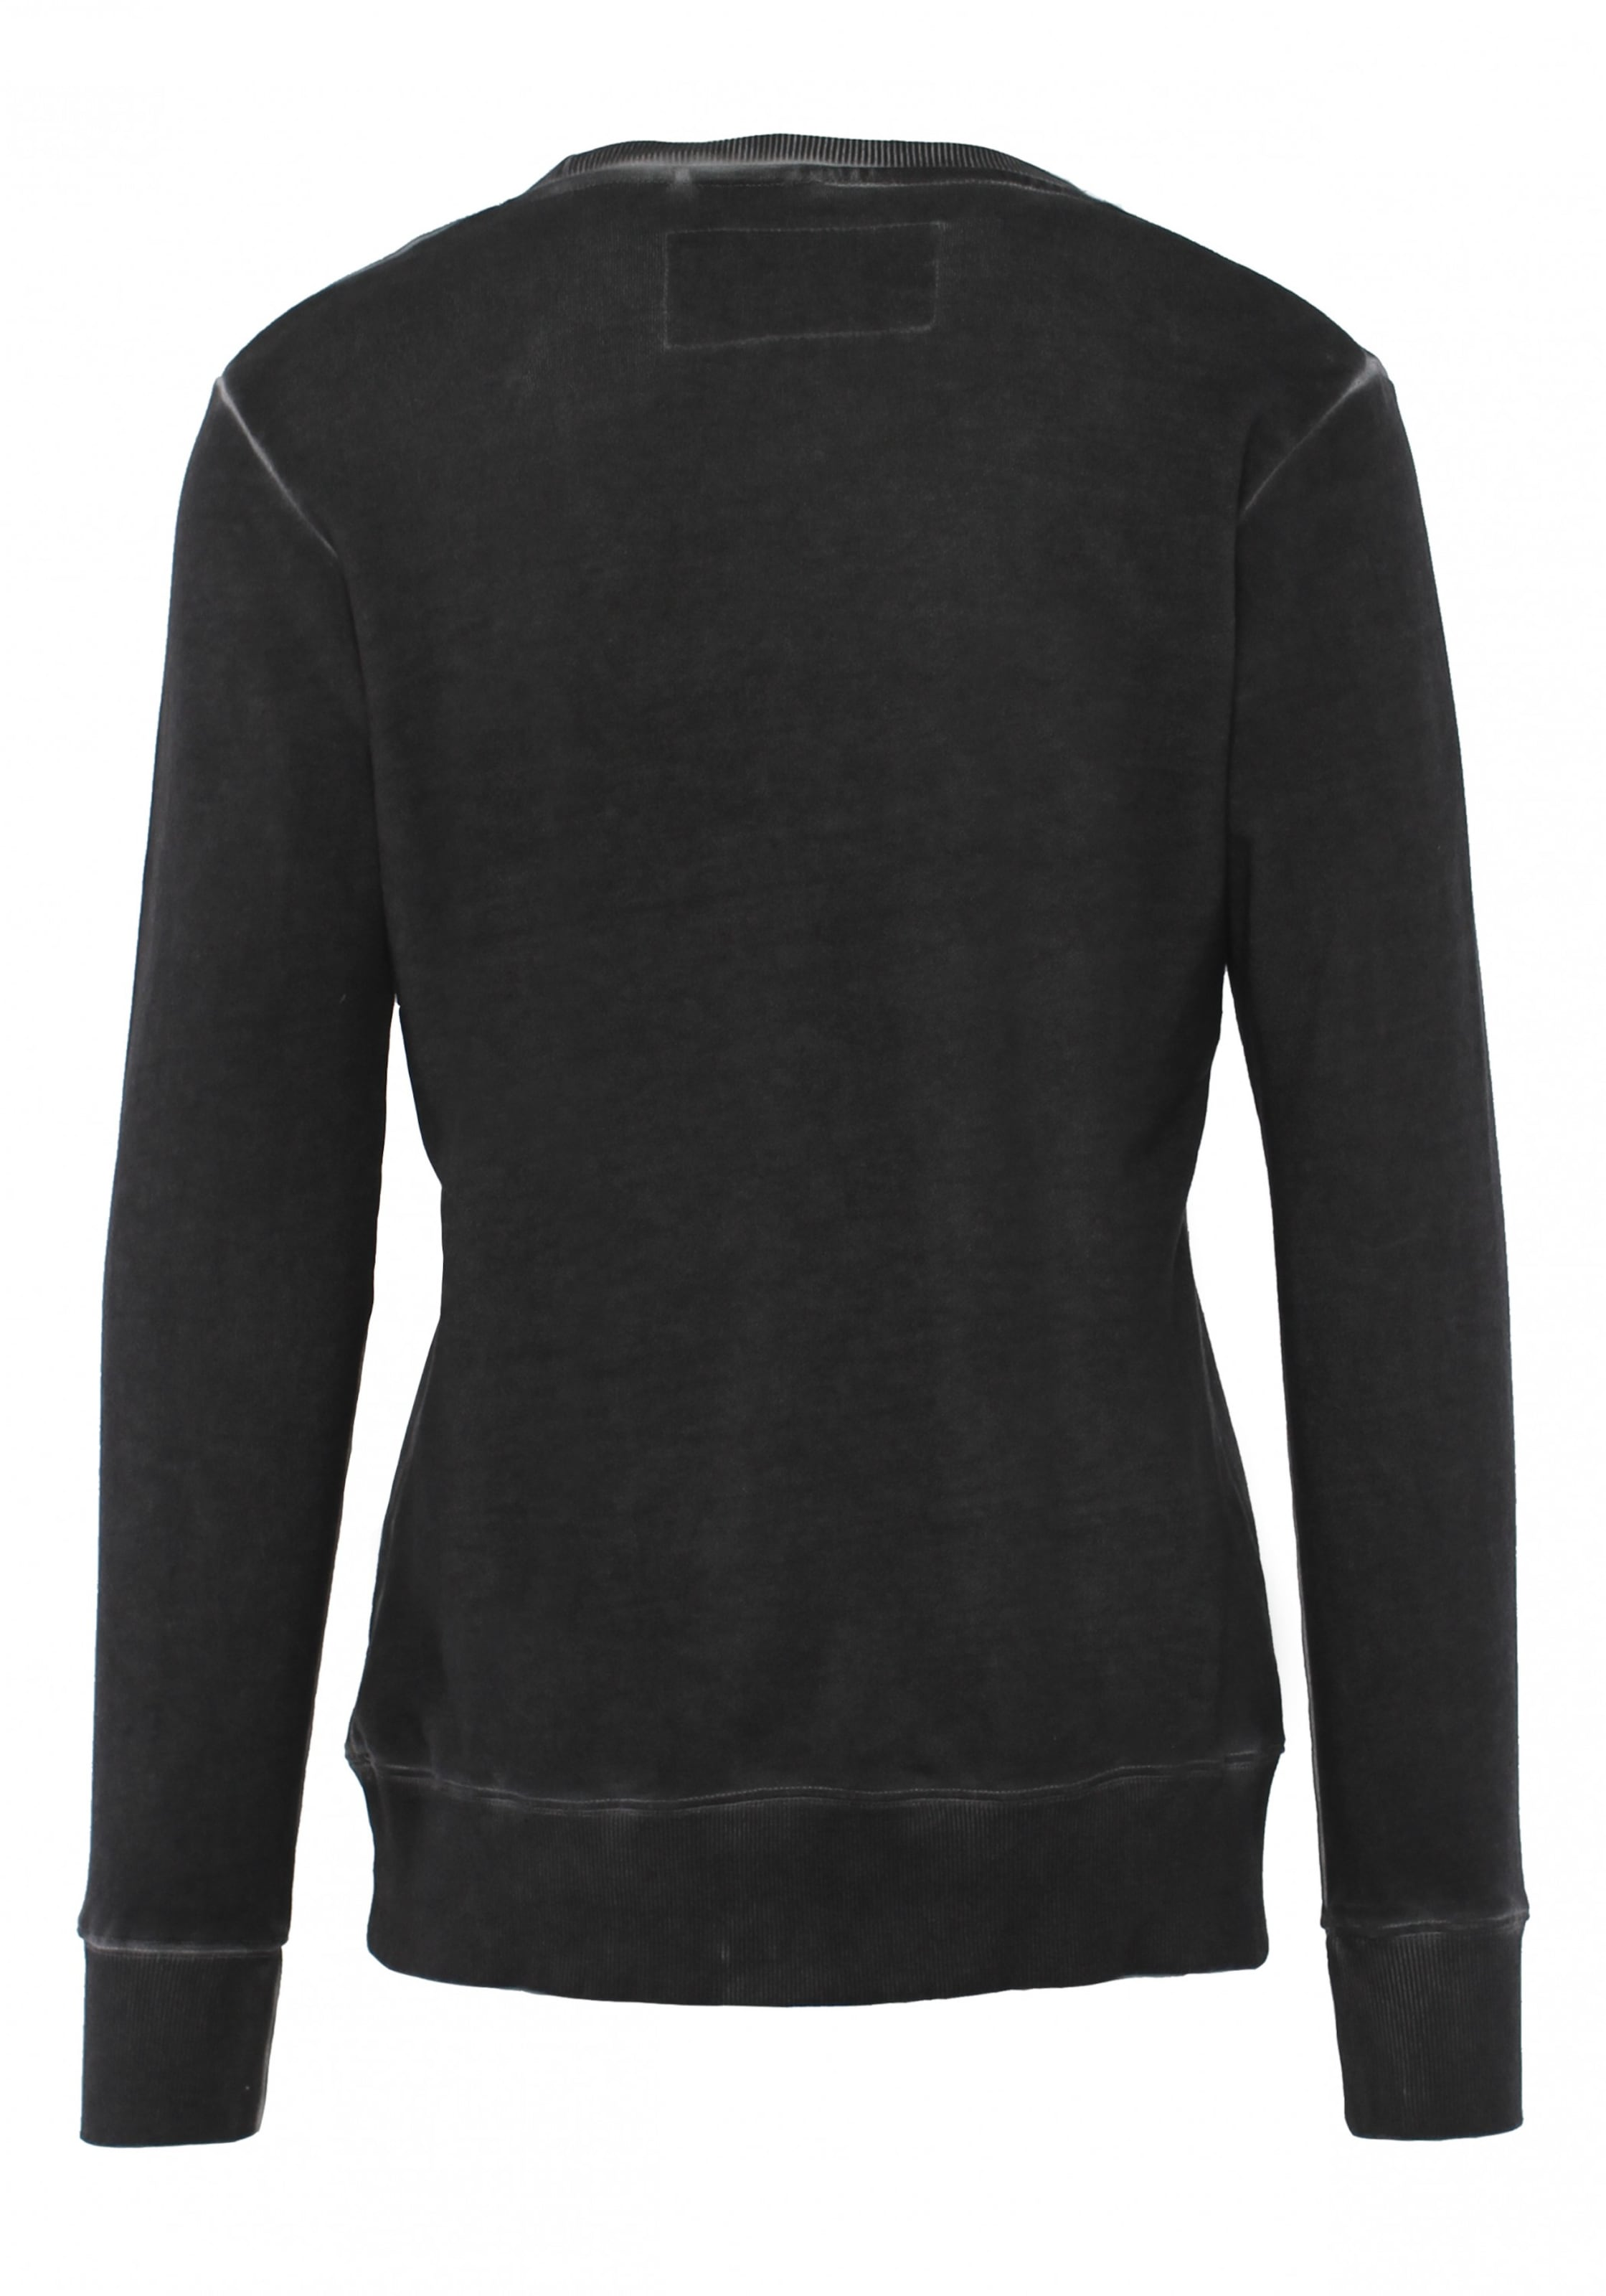 In Anthrazit Trueprodigy Sweatshirt Sweatshirt Trueprodigy Sweatshirt 'hodor' Trueprodigy 'hodor' In Anthrazit wOPkn08